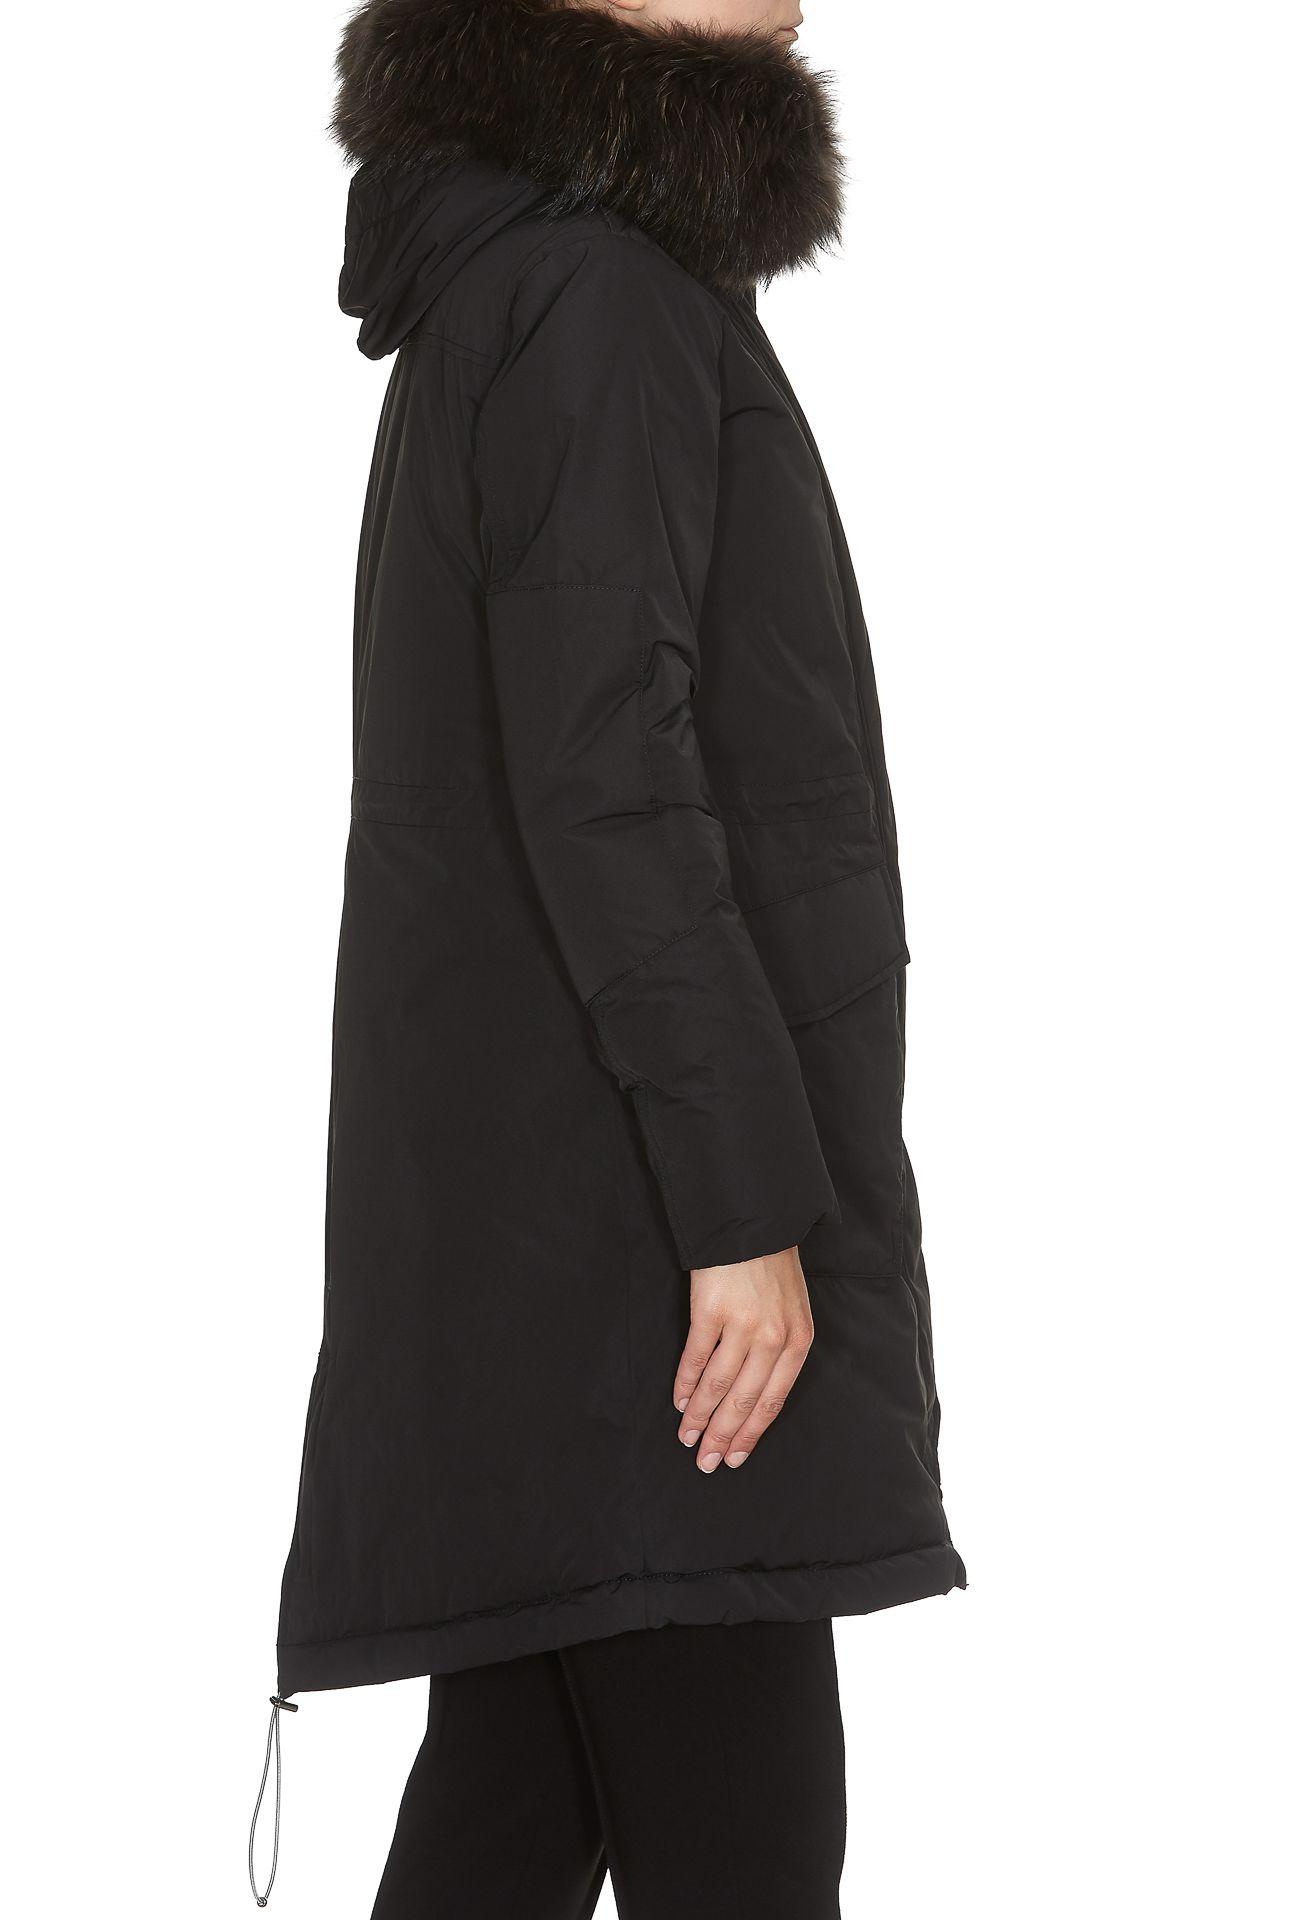 woolrich military parka black 10650263 italist. Black Bedroom Furniture Sets. Home Design Ideas